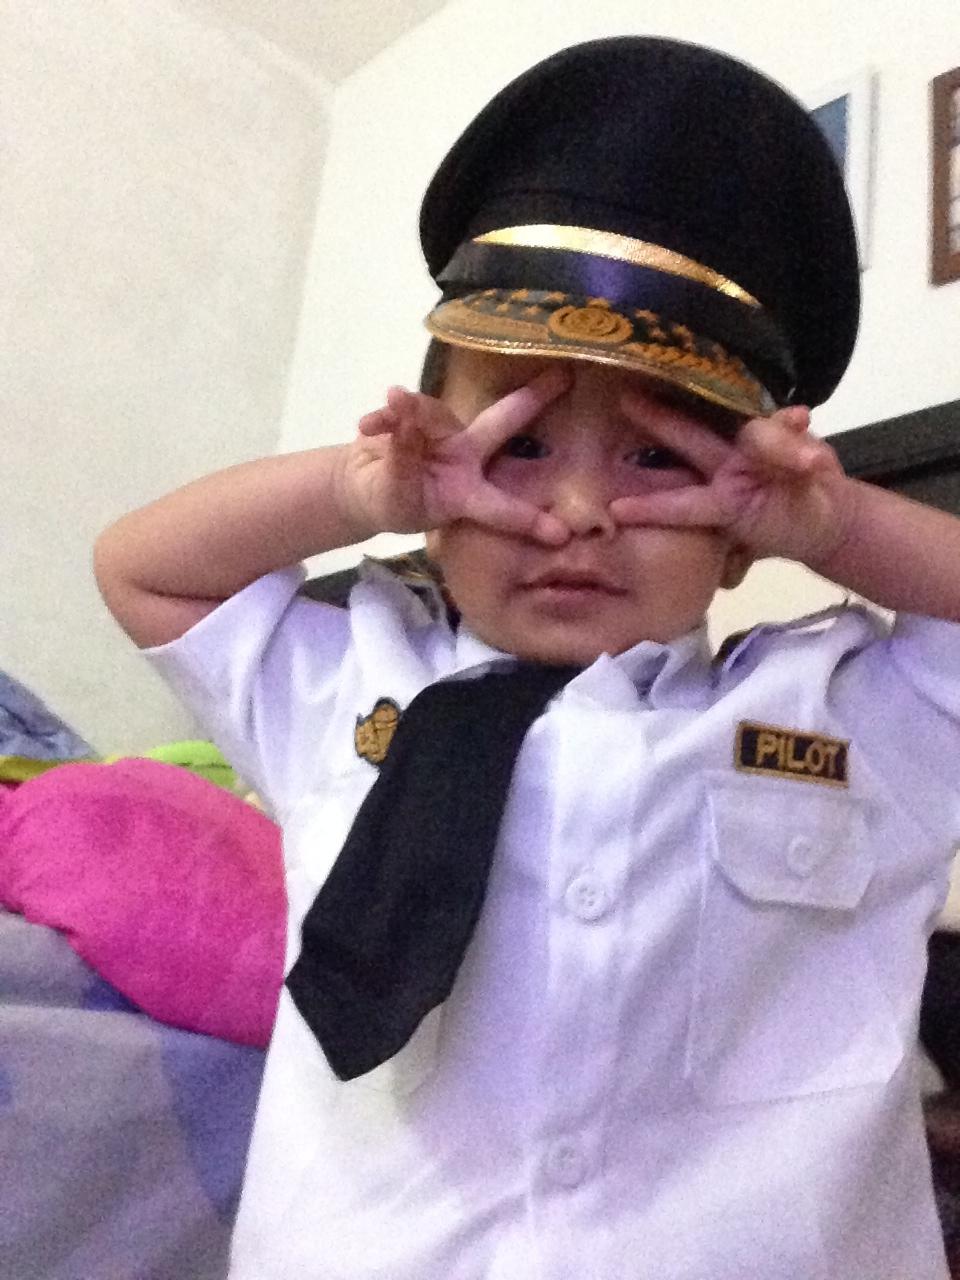 Baju Pilot Lucu Untuk Anak TK Agege Saputra